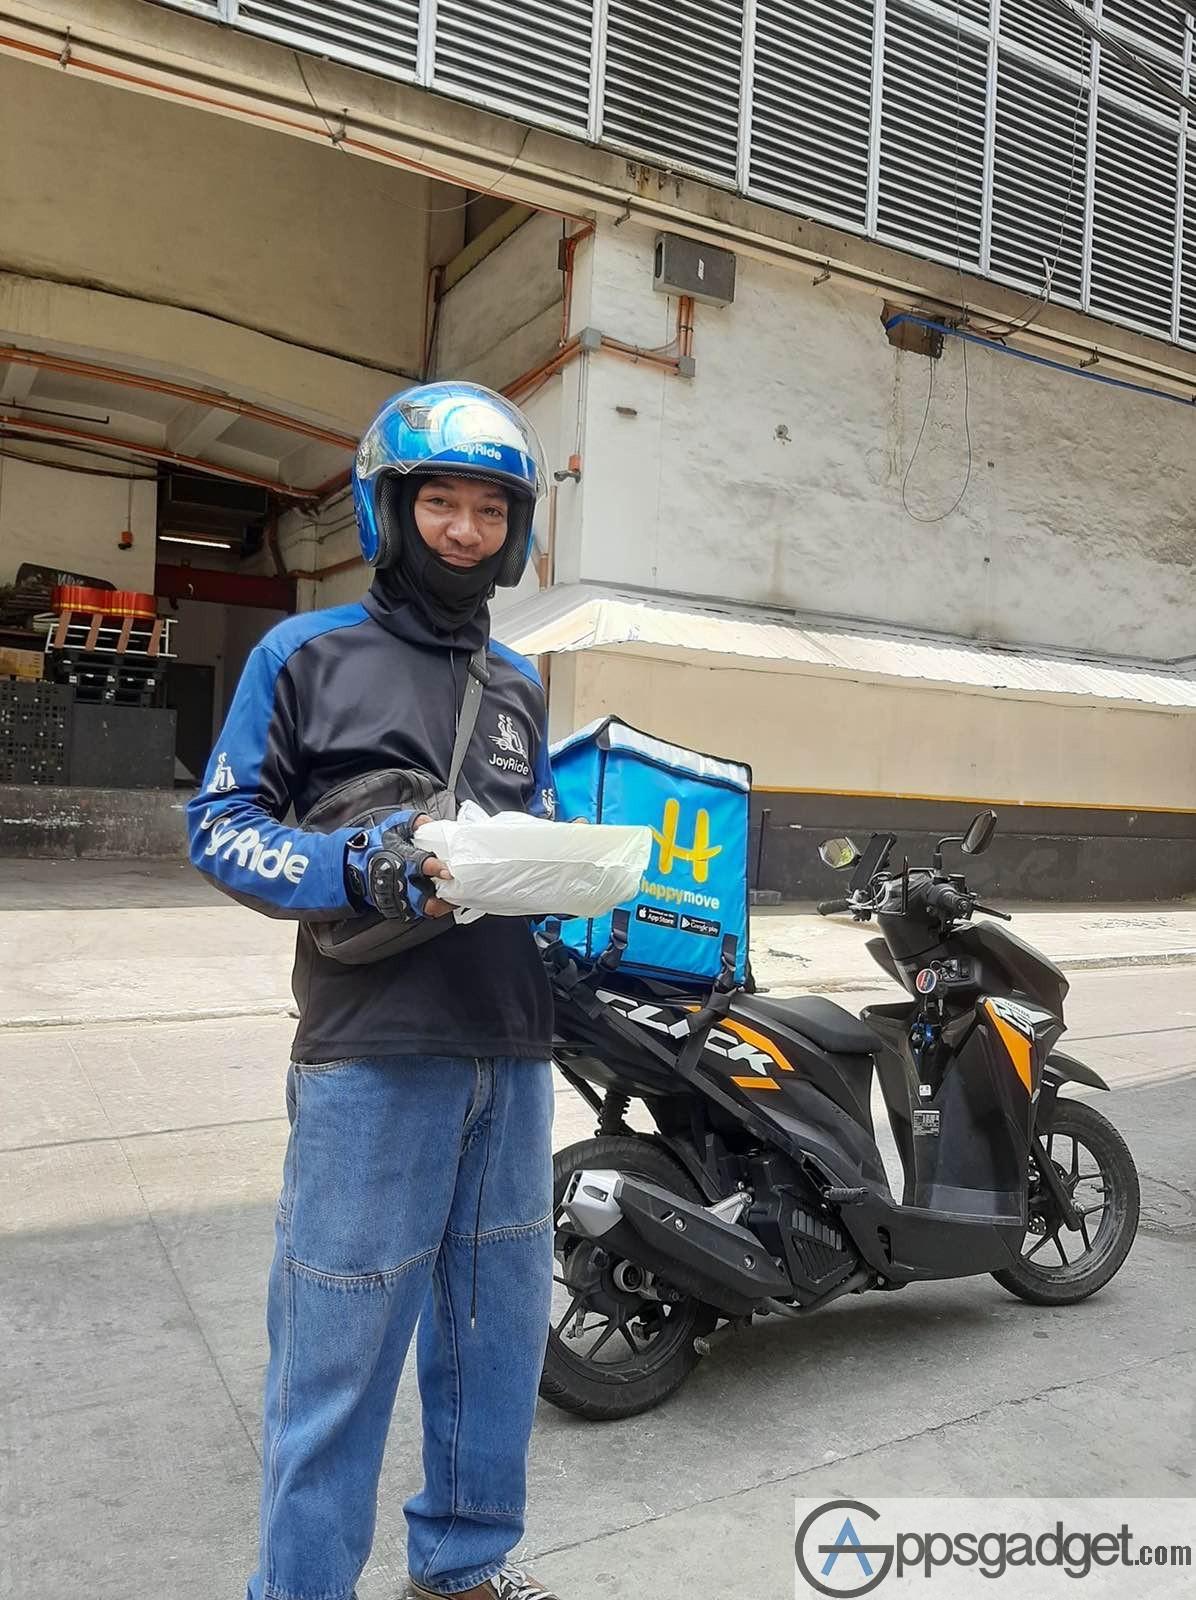 JoyRide Delivery